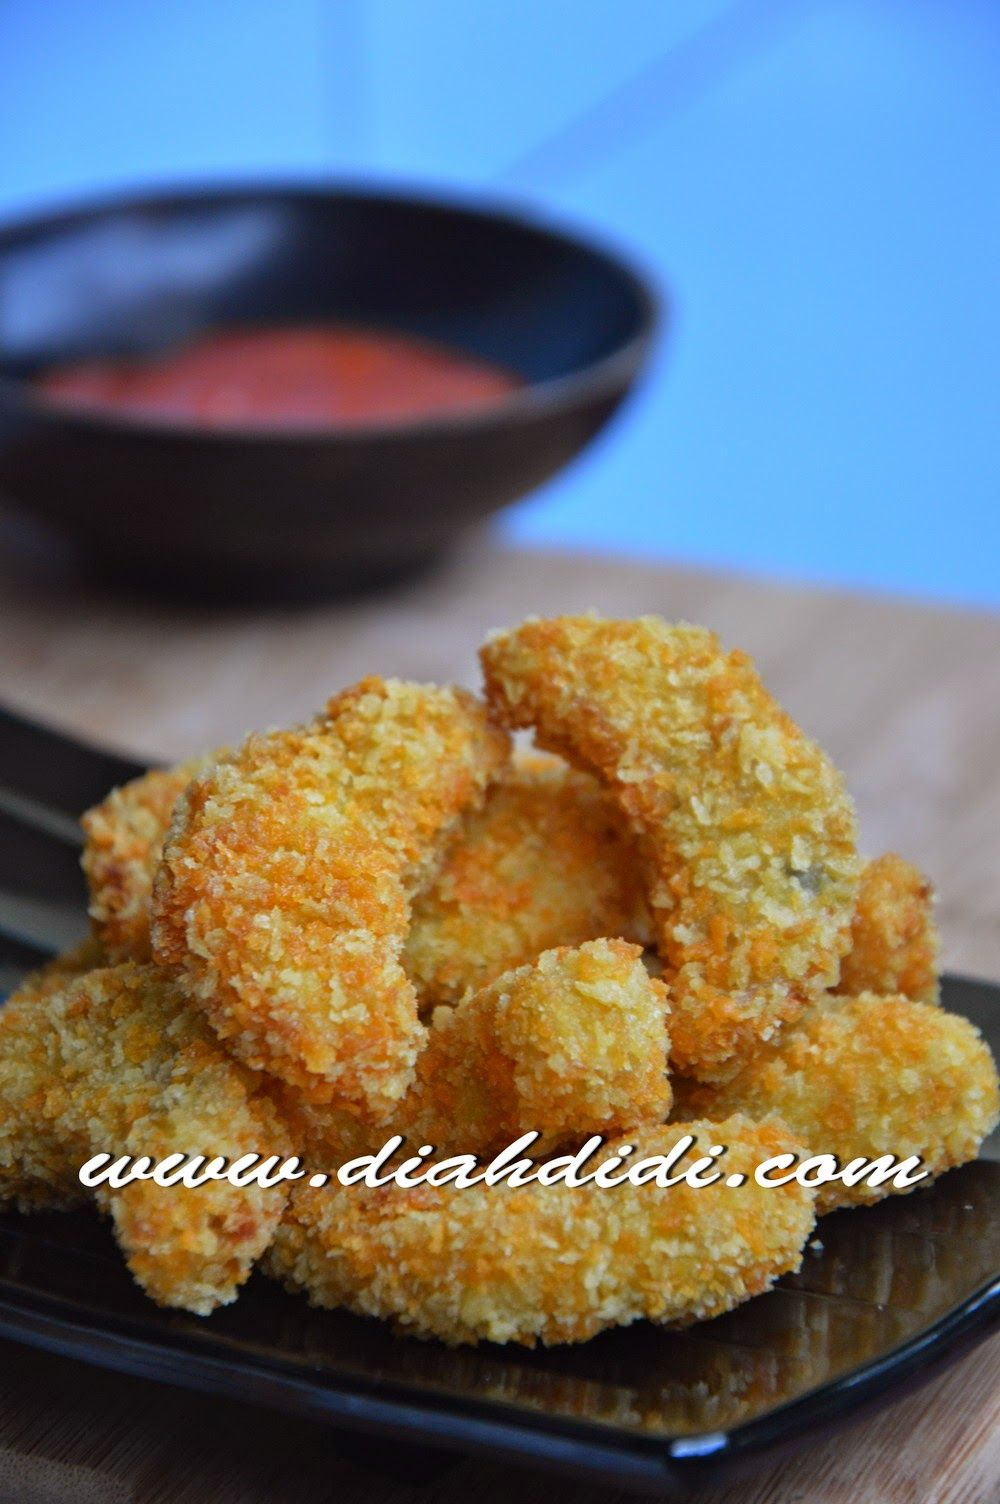 Nugget Ayam Wortel Resep Masakan Makanan Dan Minuman Makanan